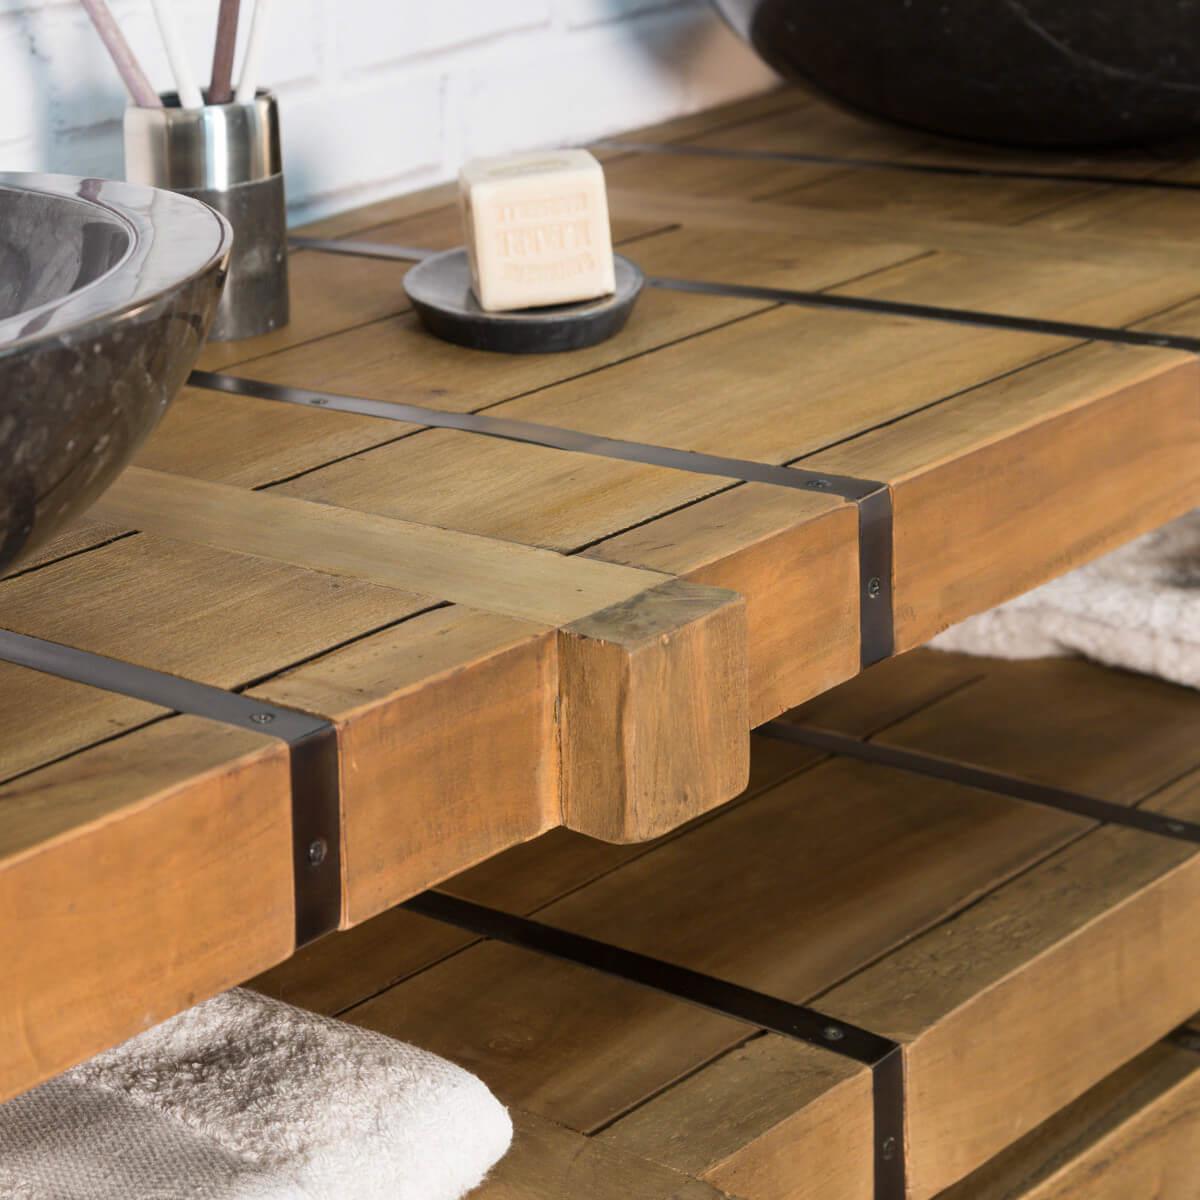 Meuble sous vasque double vasque en bois mindi massif for Meuble salle de bain castorama double vasque